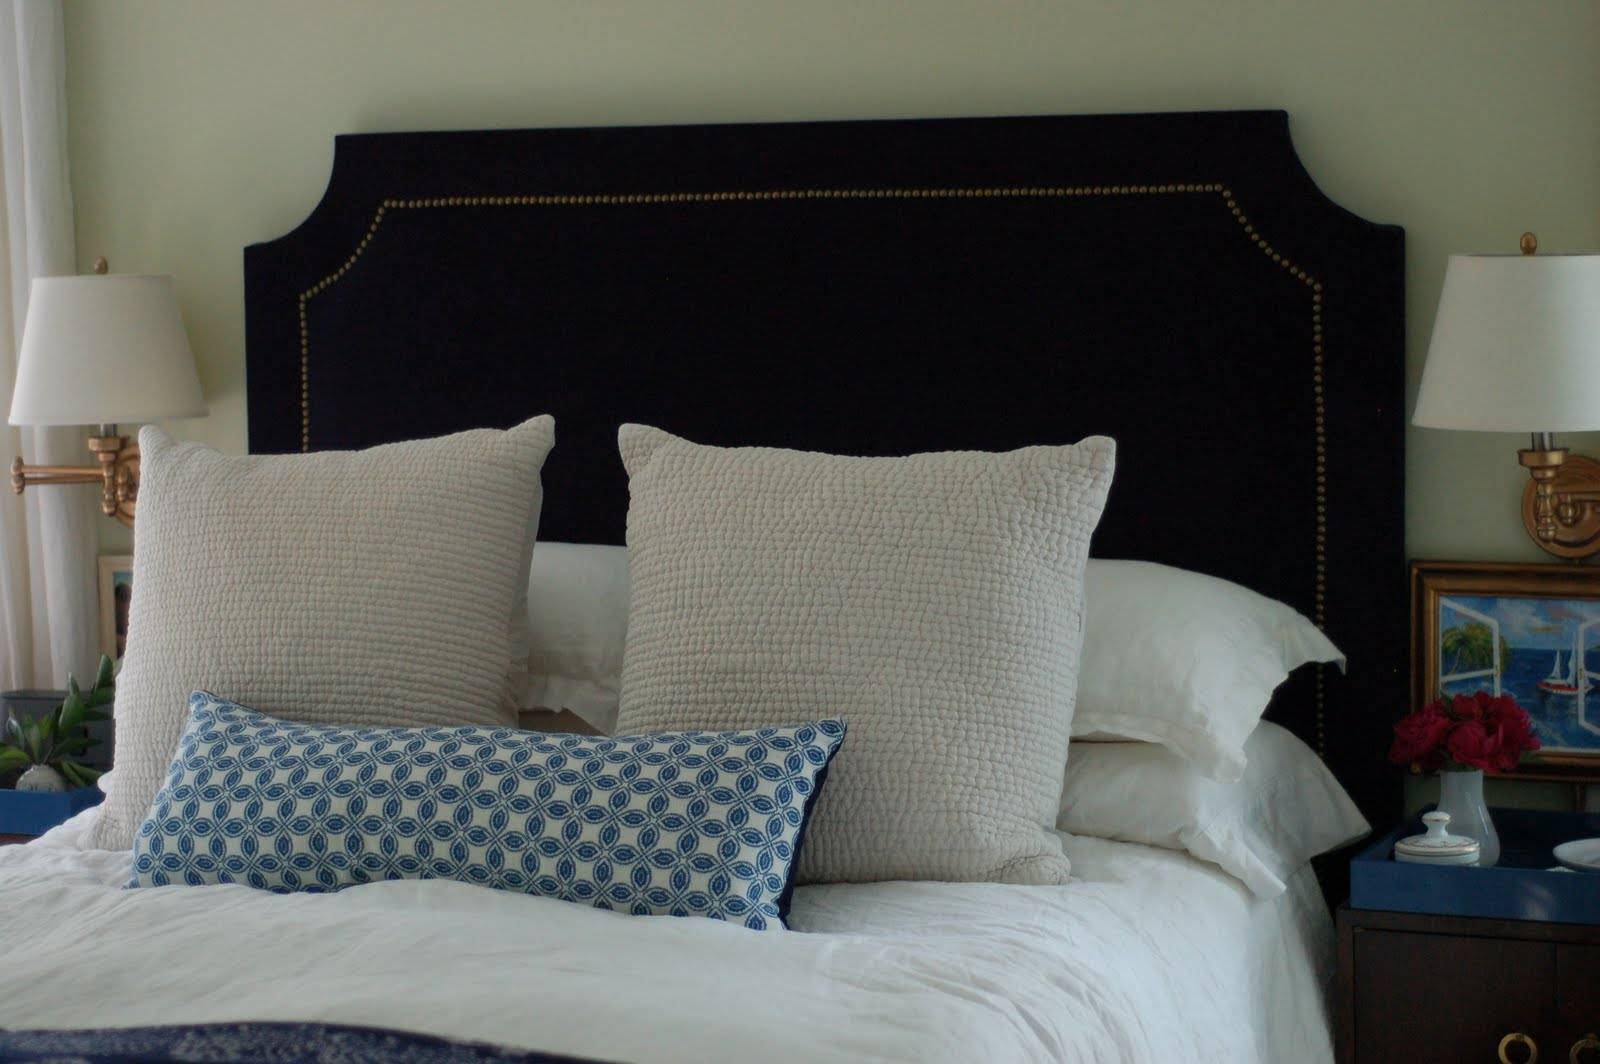 12 devonshire DIY Upholstered Headboard with Nailhead Trim